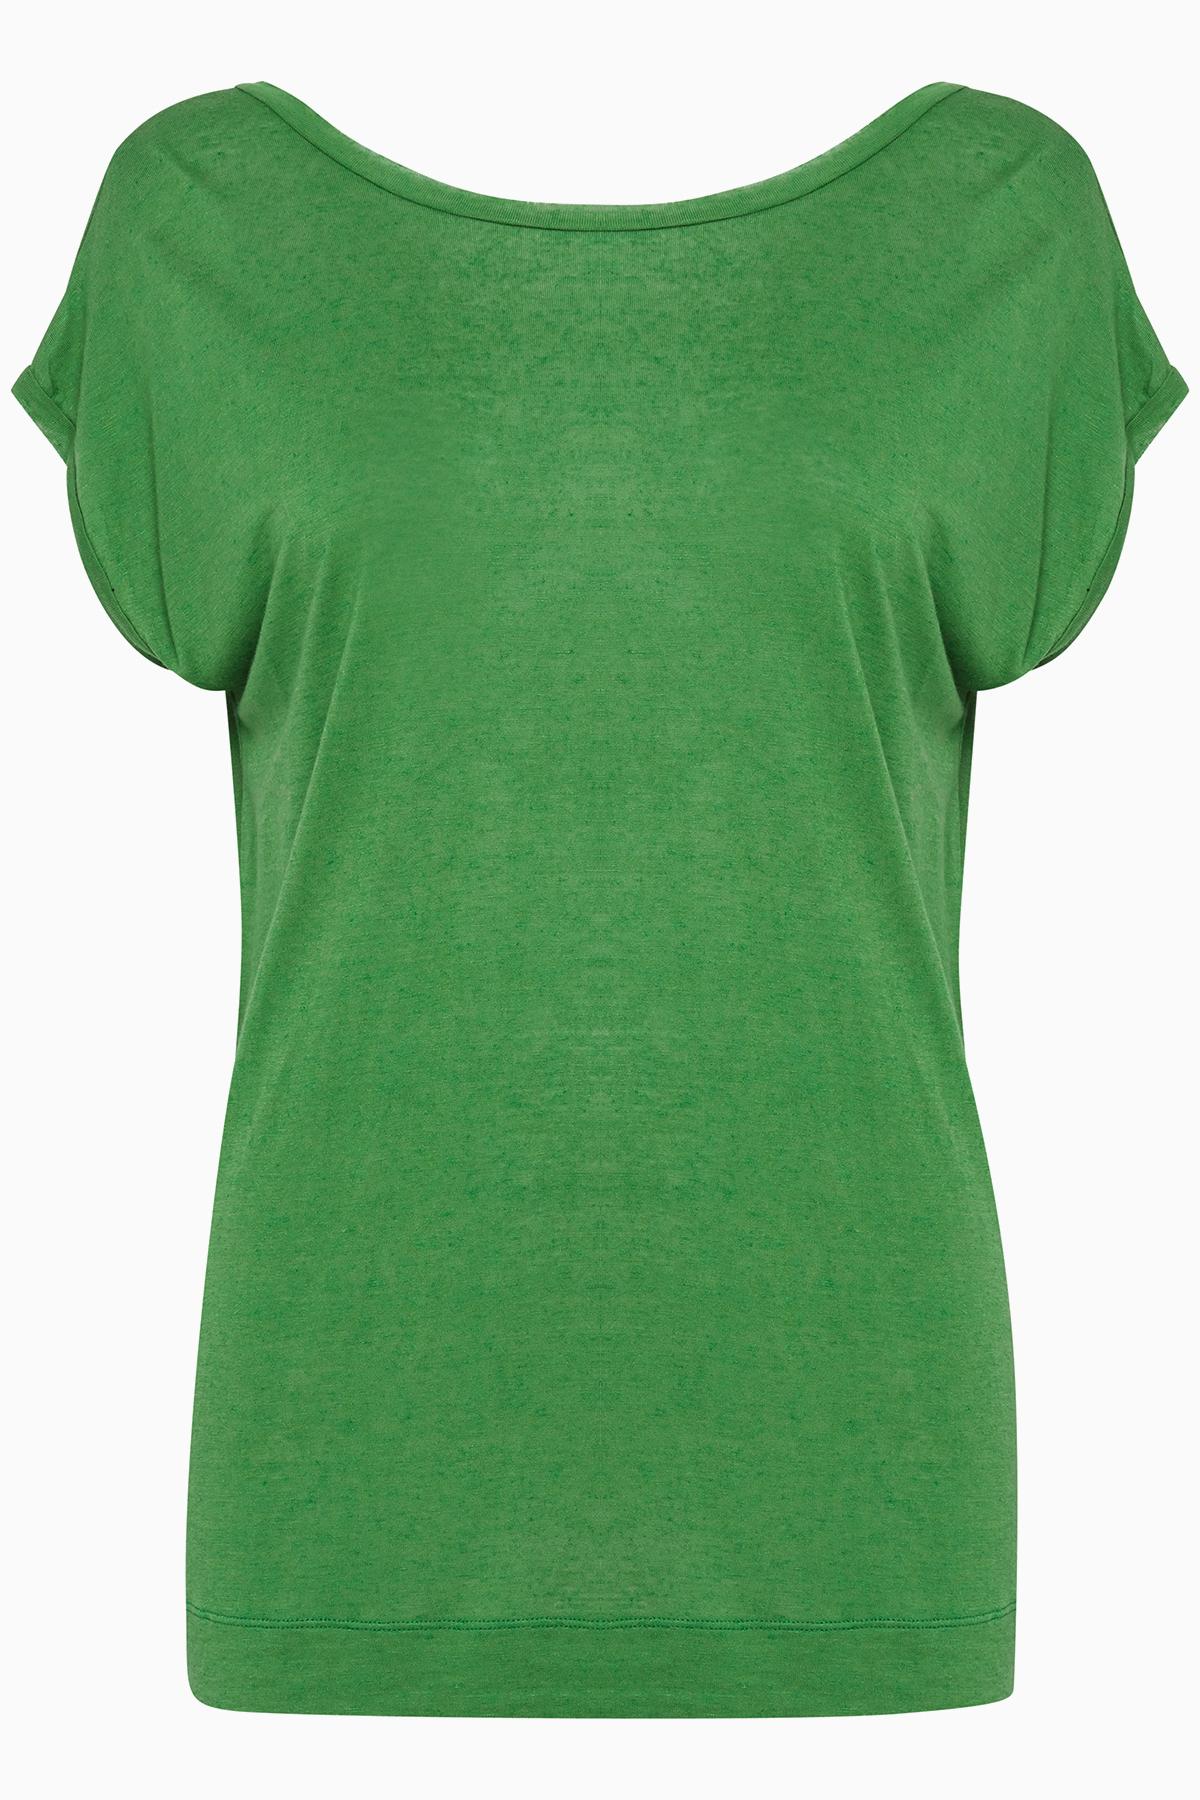 Pulz Jeans Dame T-shirt korte mouw - Groen